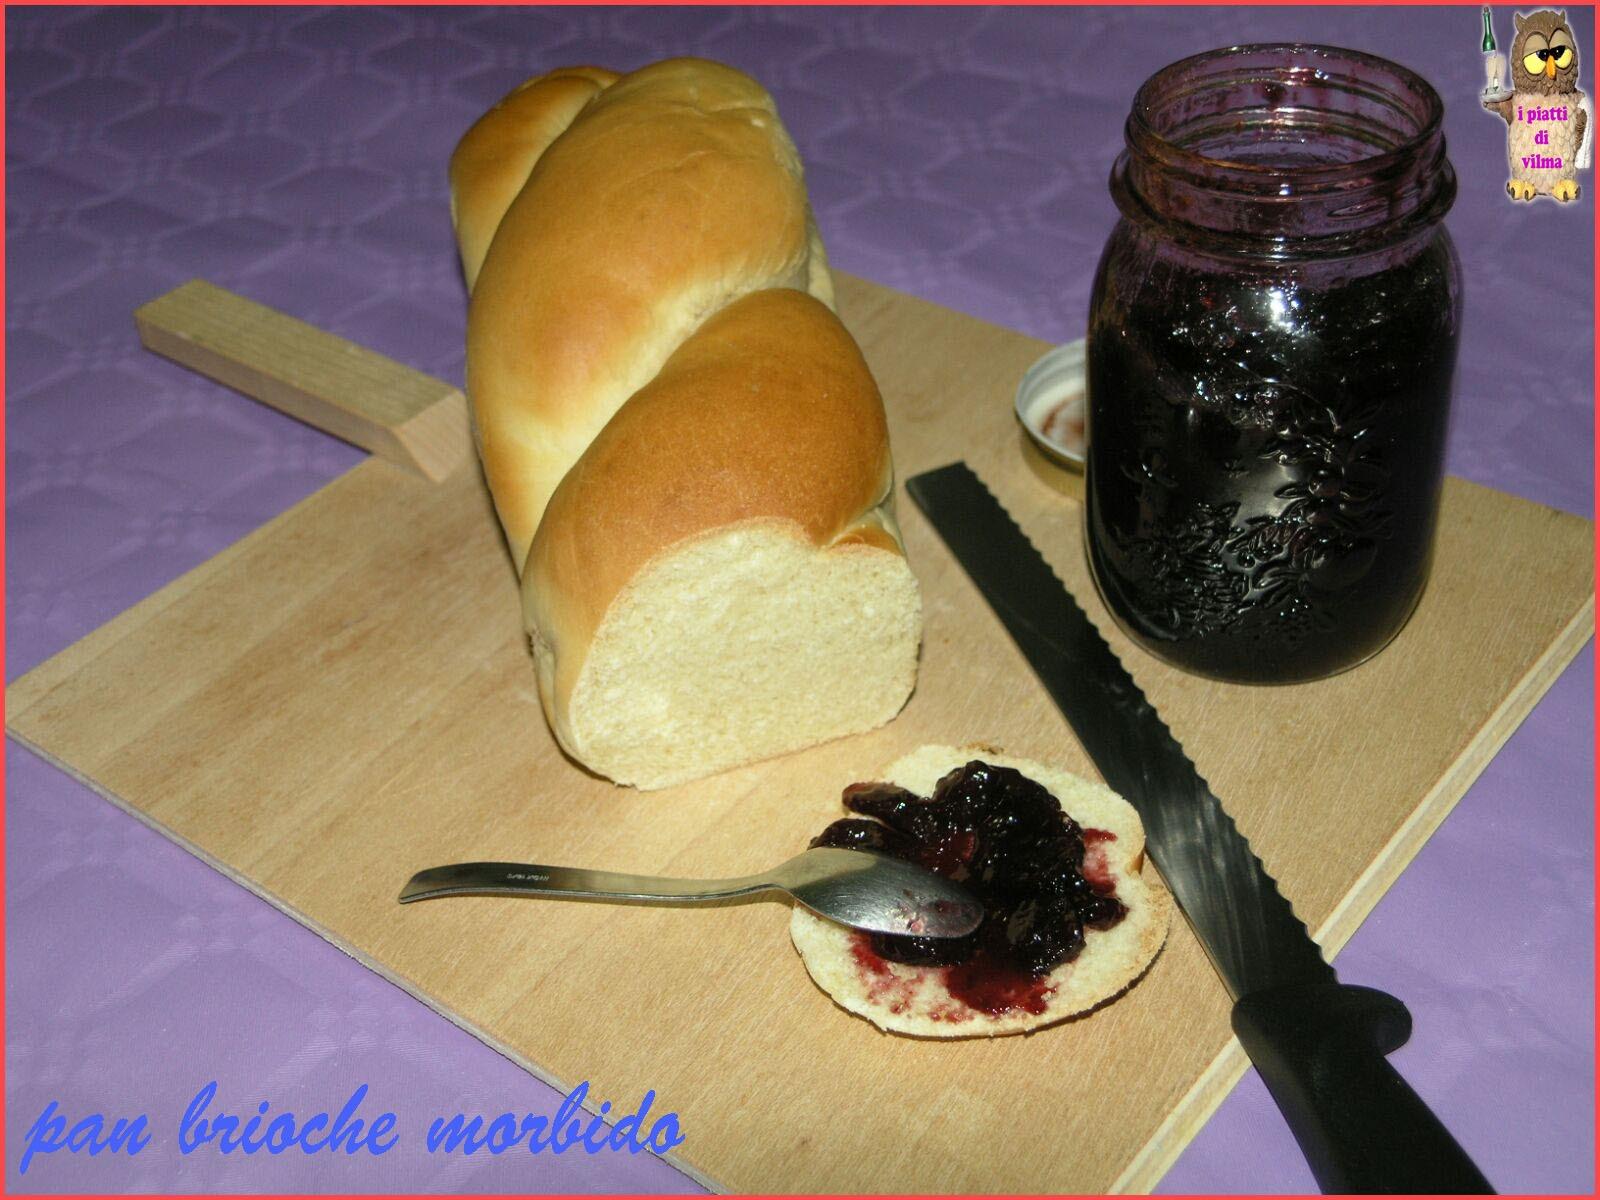 pan brioche morbido